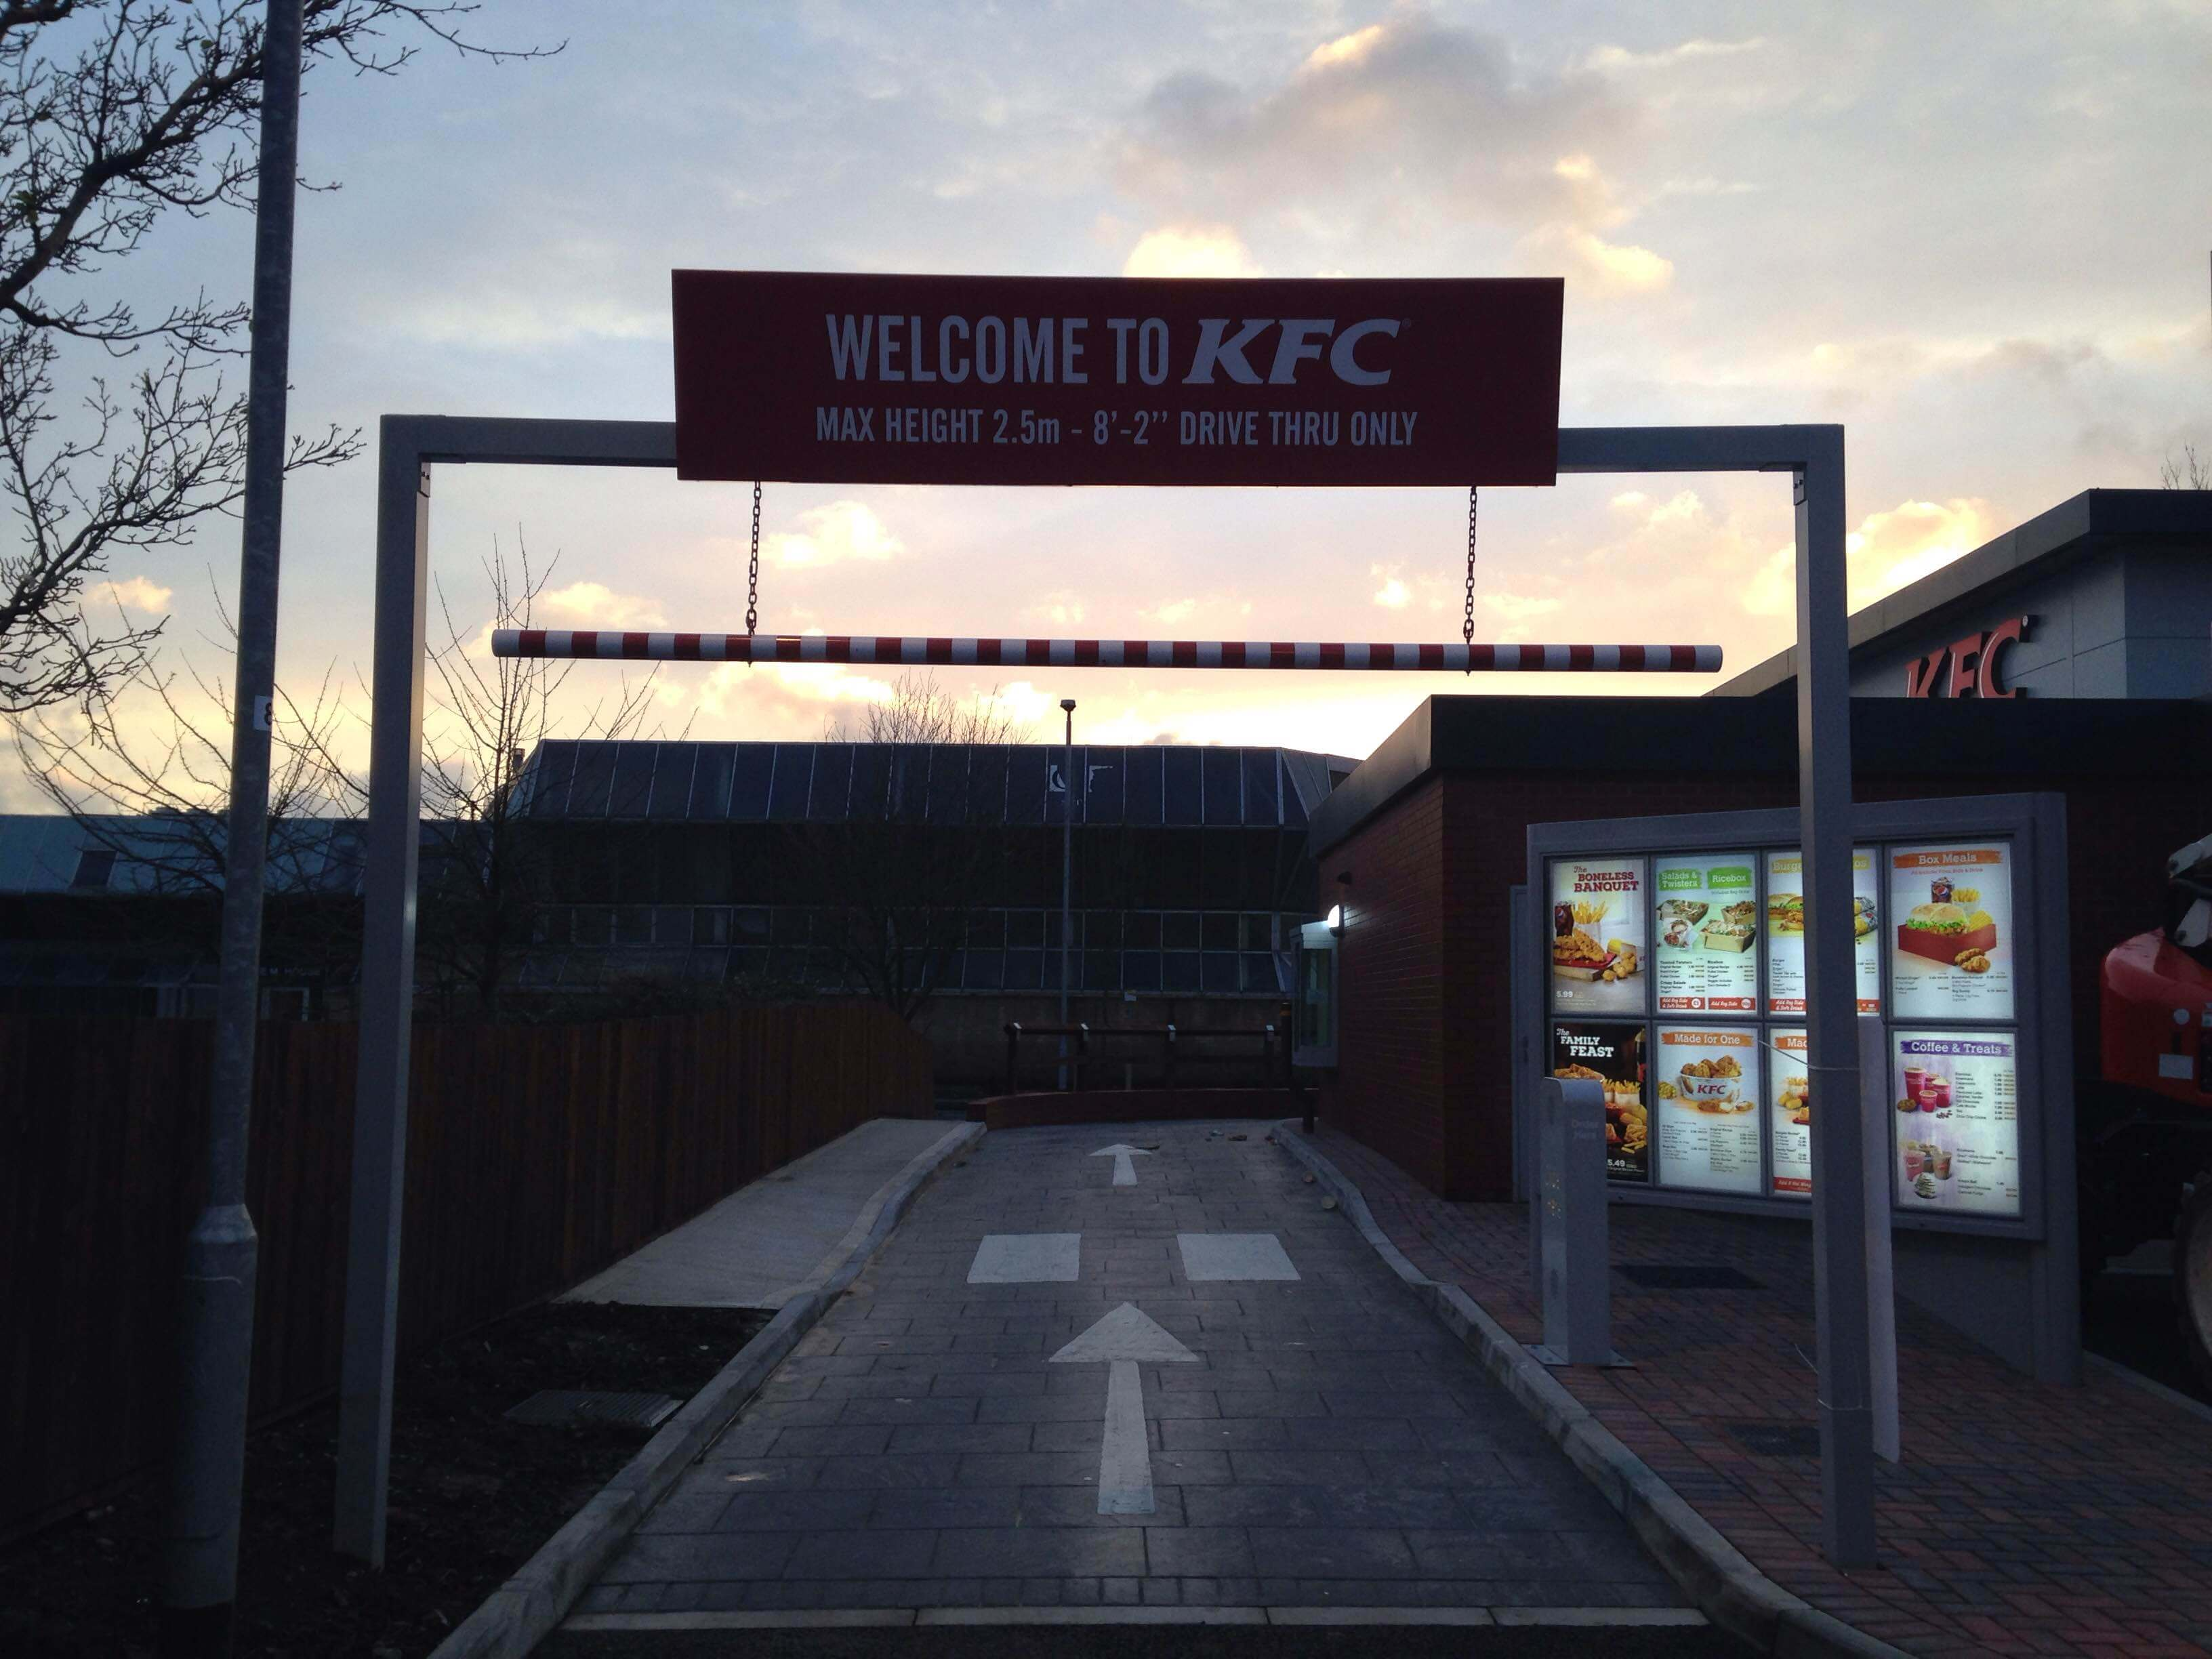 KFC drive thru entrance